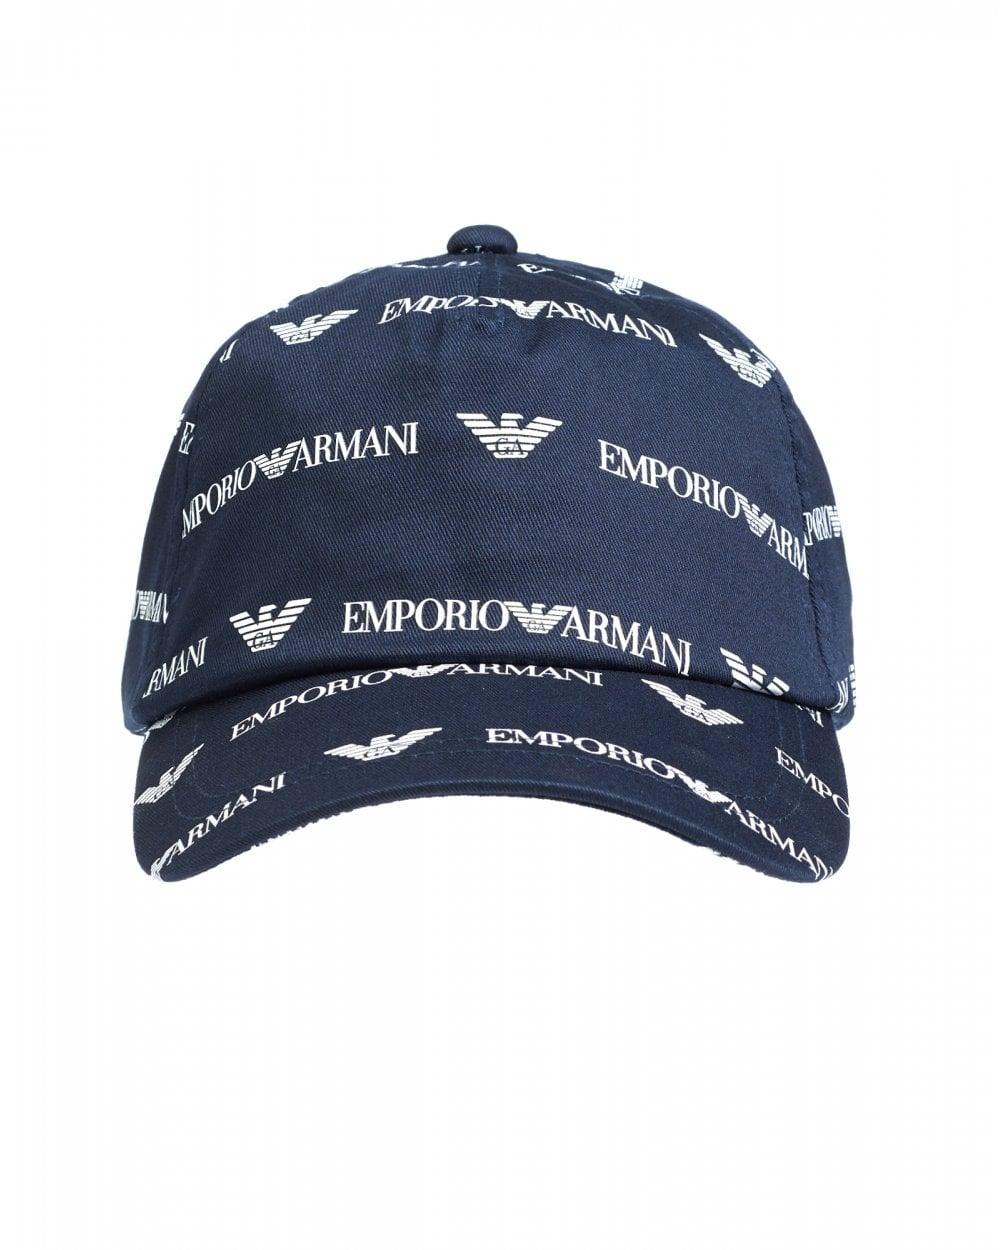 71061d8b Emporio Armani Mens Baseball Cap, All-Over Logo Hat